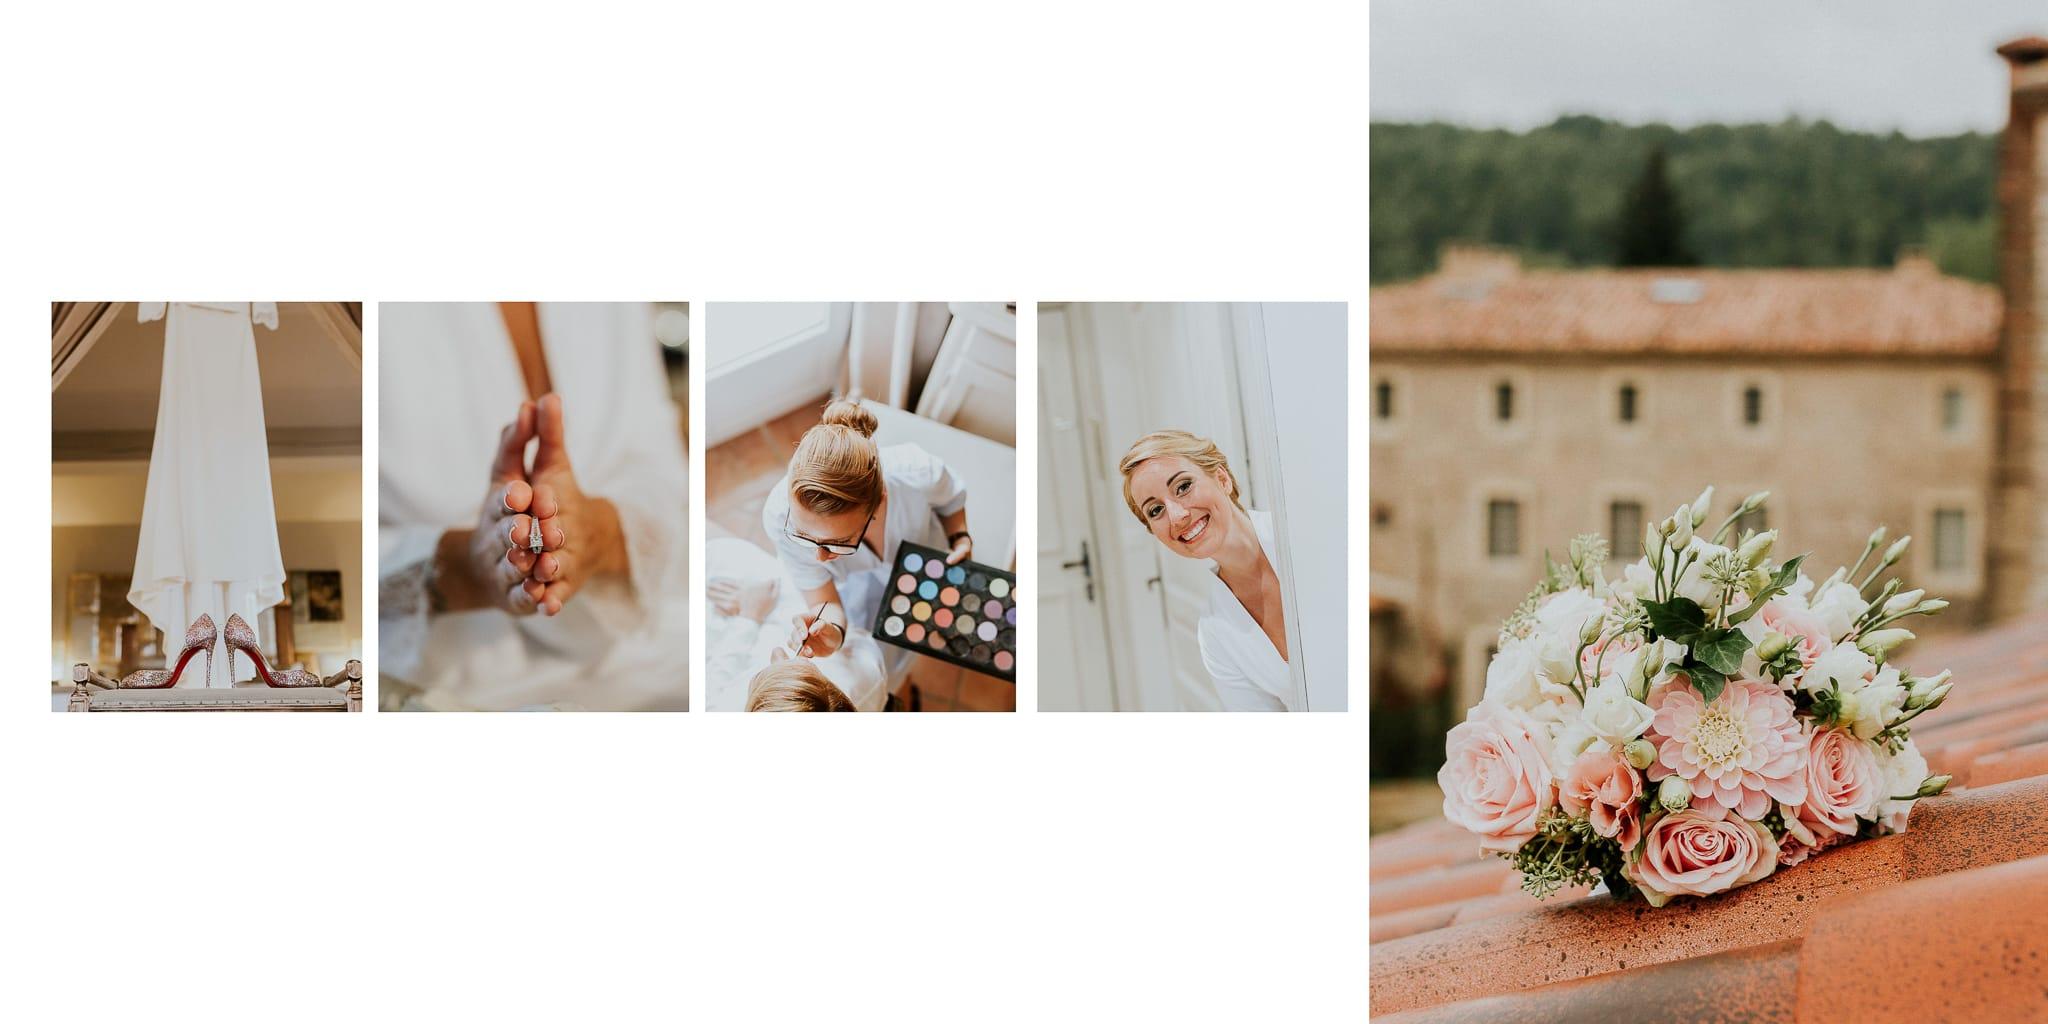 Costi-Moiceanu-Photographer-CM-Photography-Wedding-Mariage-French-Riviera-Cote-D-Azur-Alpes-Maritimes-Weding-Album-Design-5